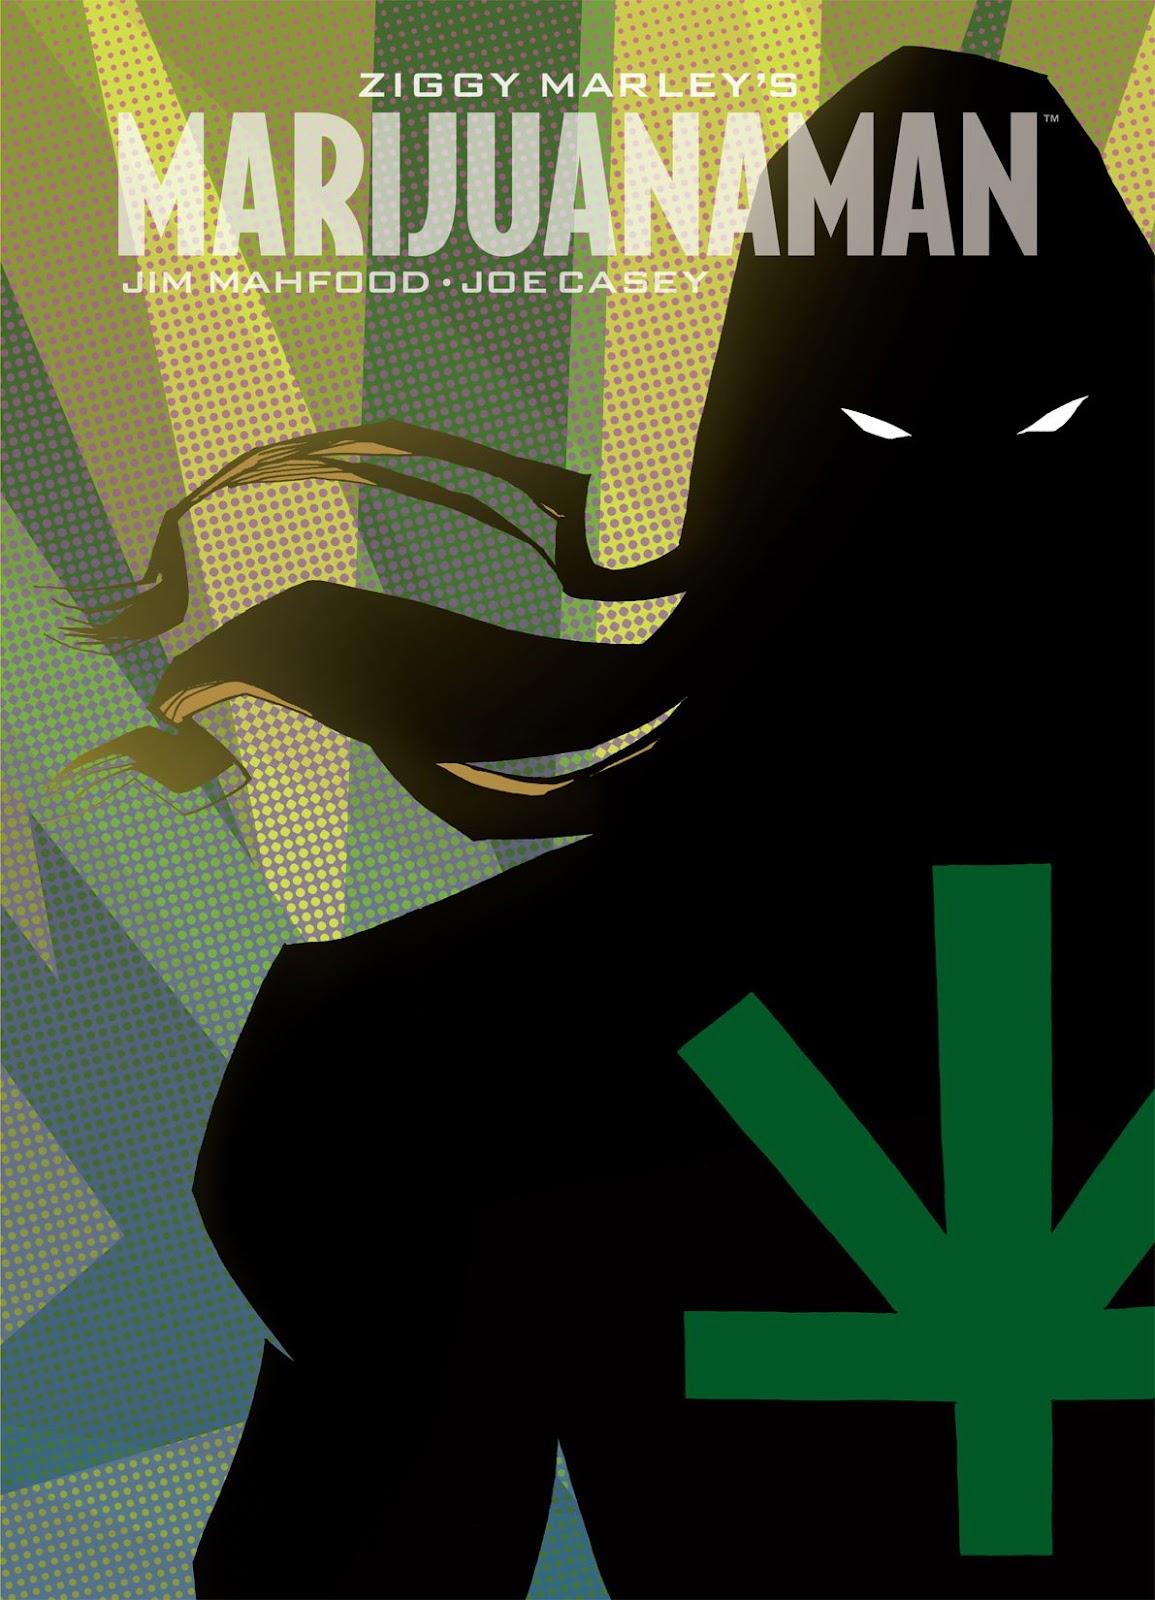 Read online Marijuanaman comic -  Issue # Full - 1